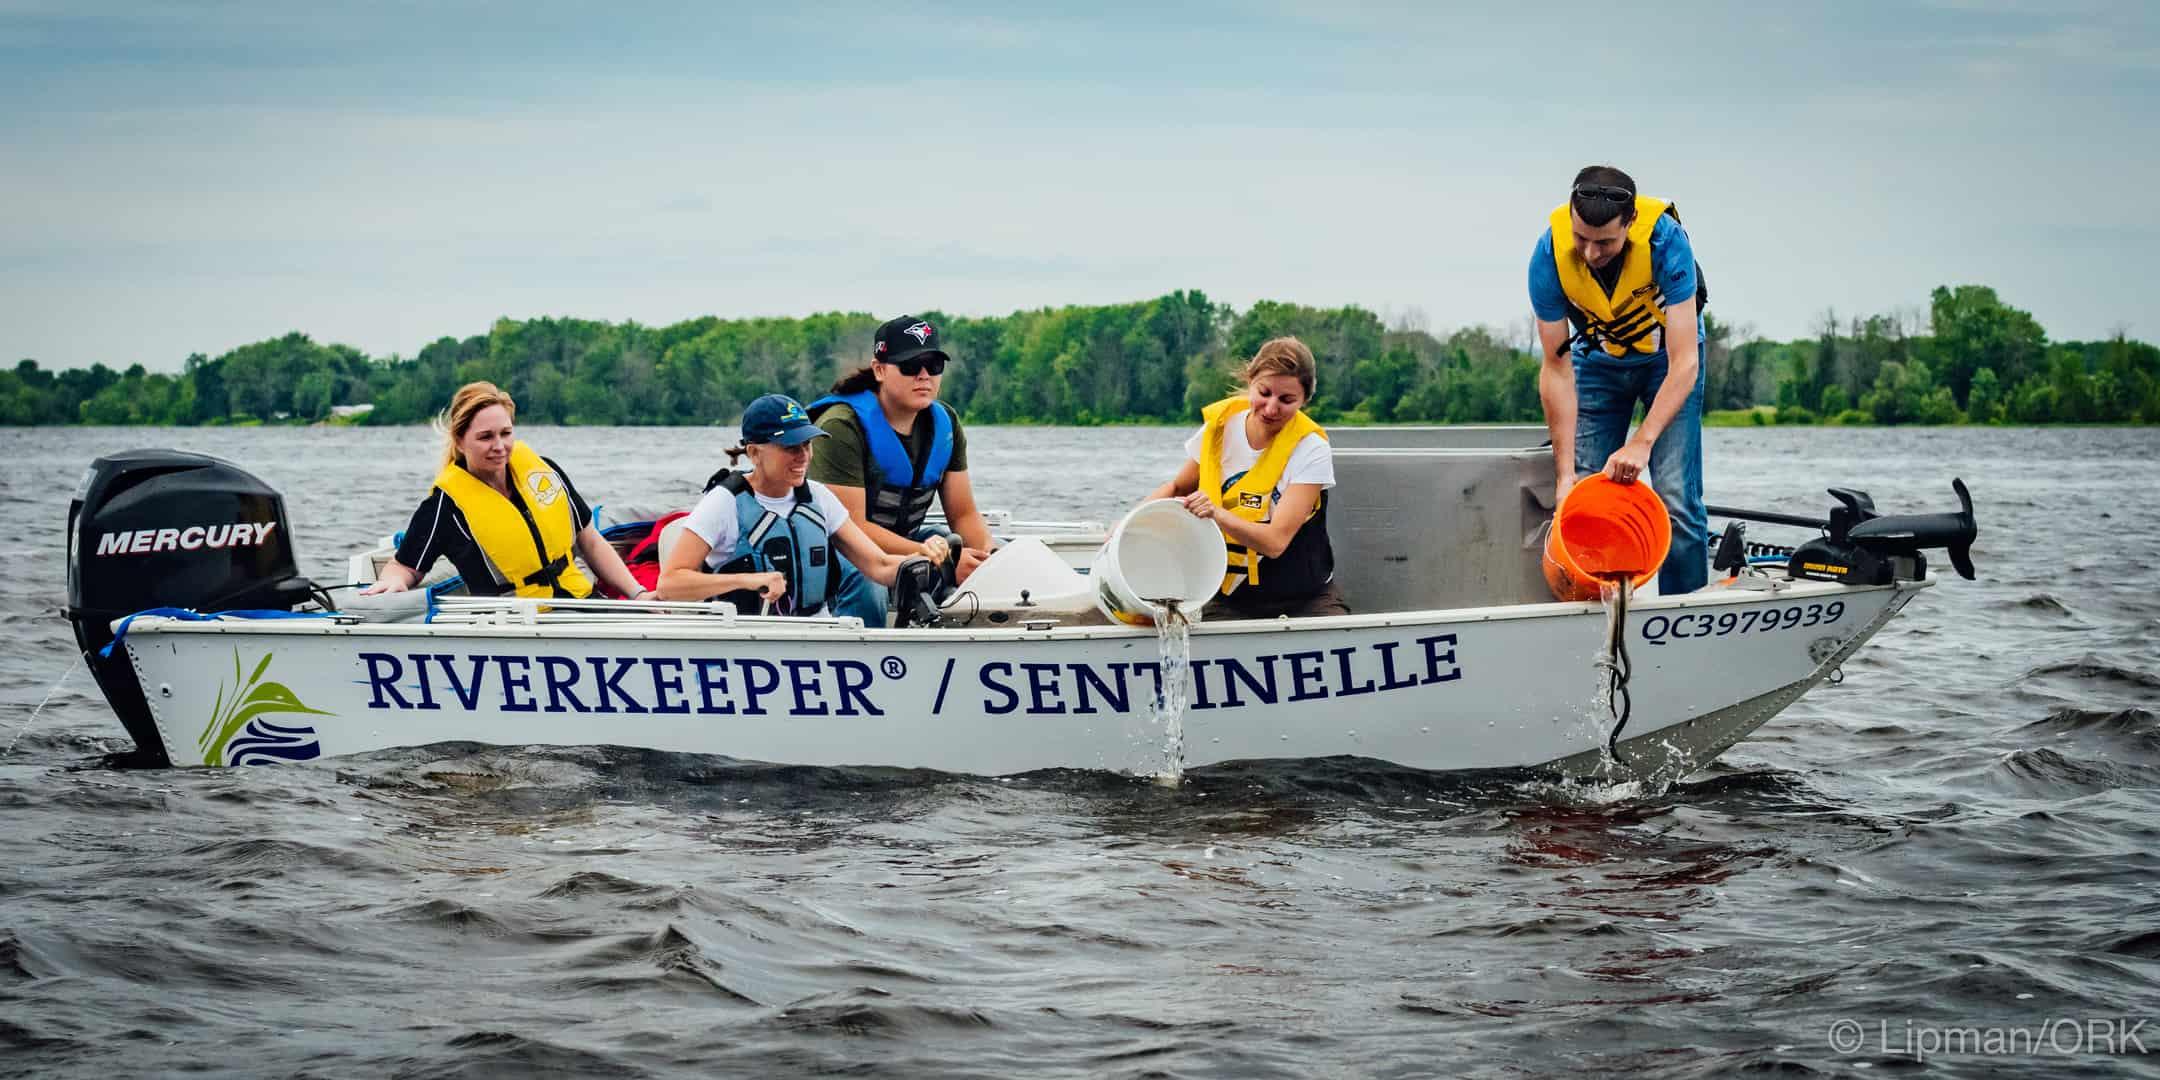 Ottawa Riverkeeper releases 400 American Eels into the Ottawa River